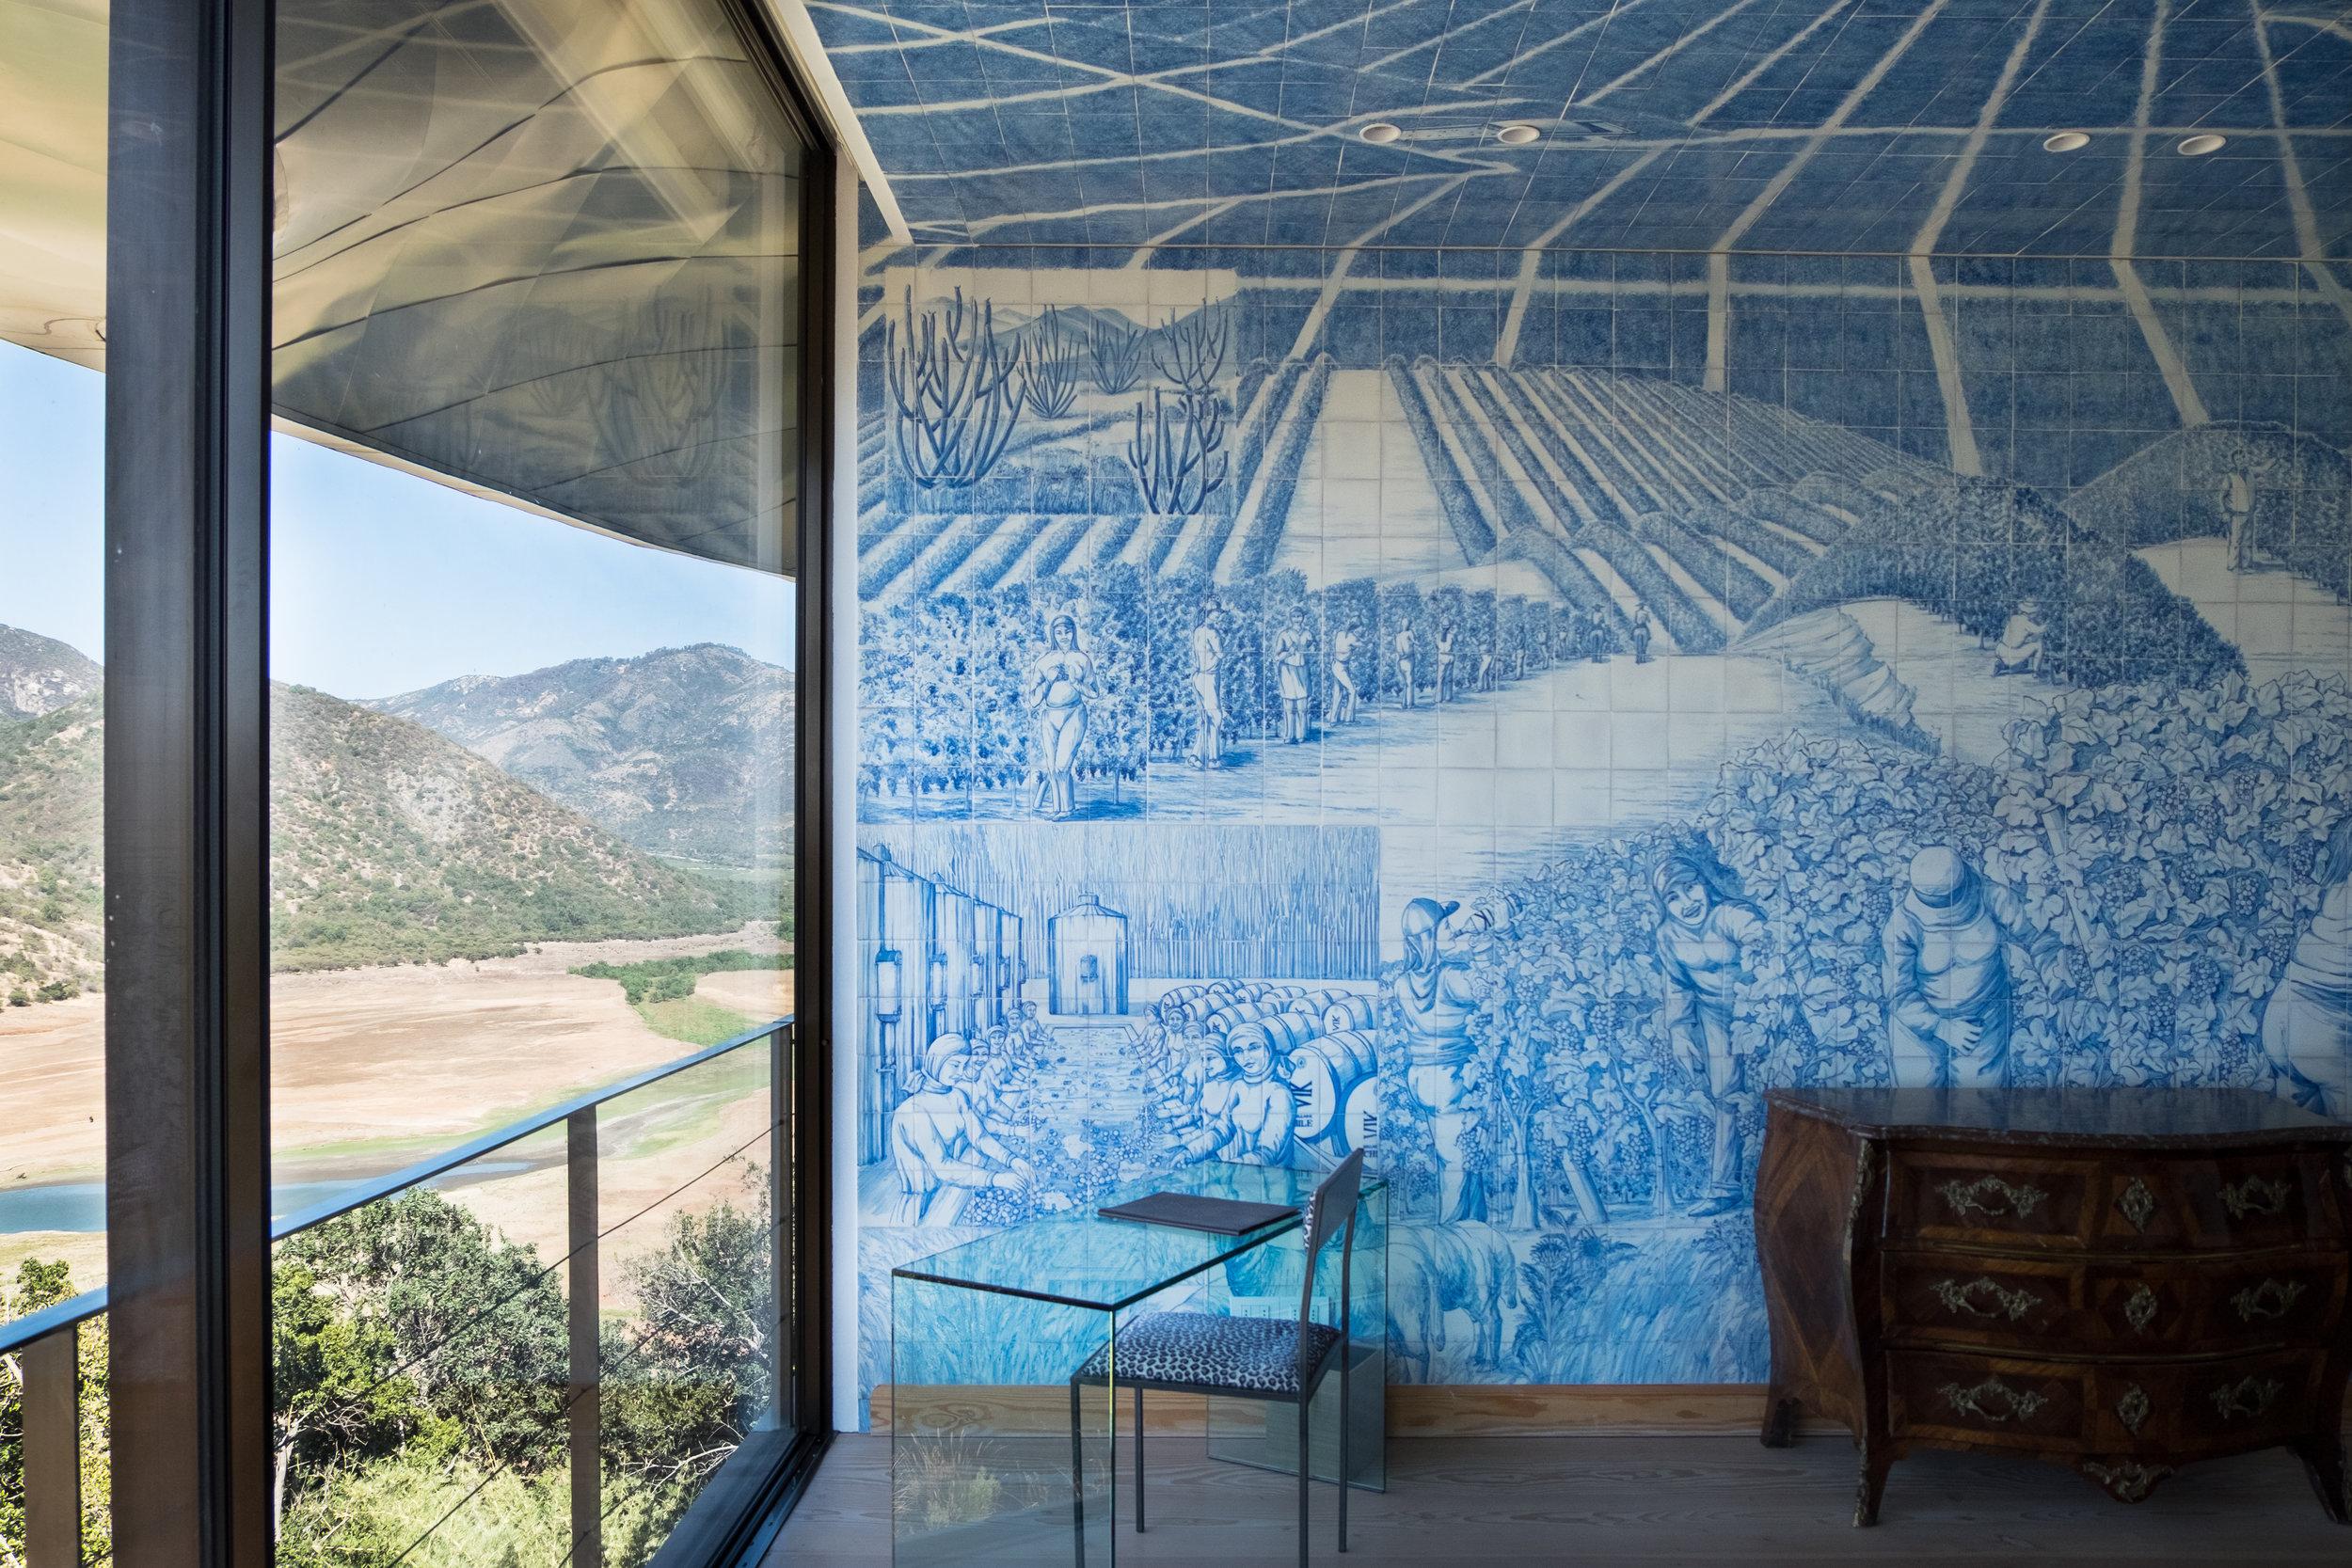 The Azulejo suite